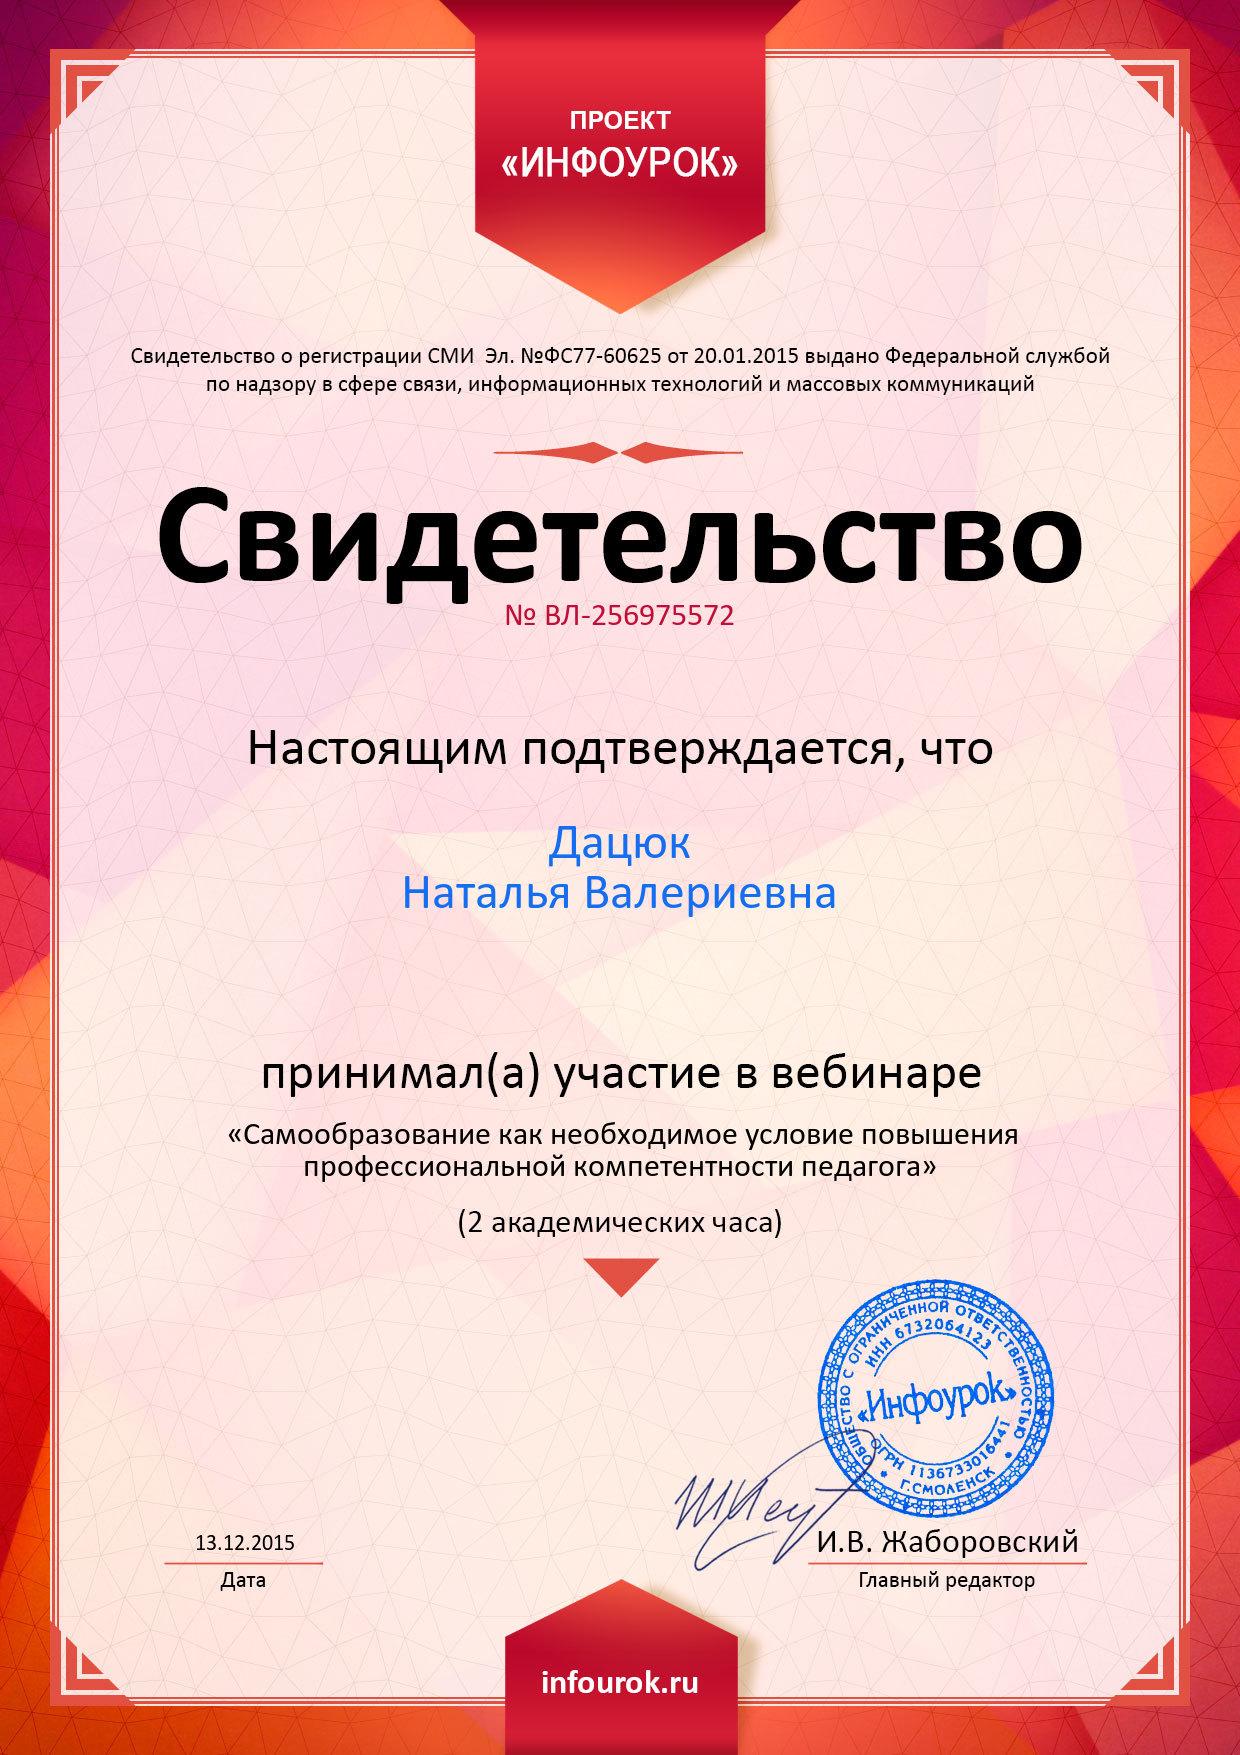 C:\Users\COMPP\Downloads\Свидетельство проекта infourok.ru № ВЛ-256975572.jpg